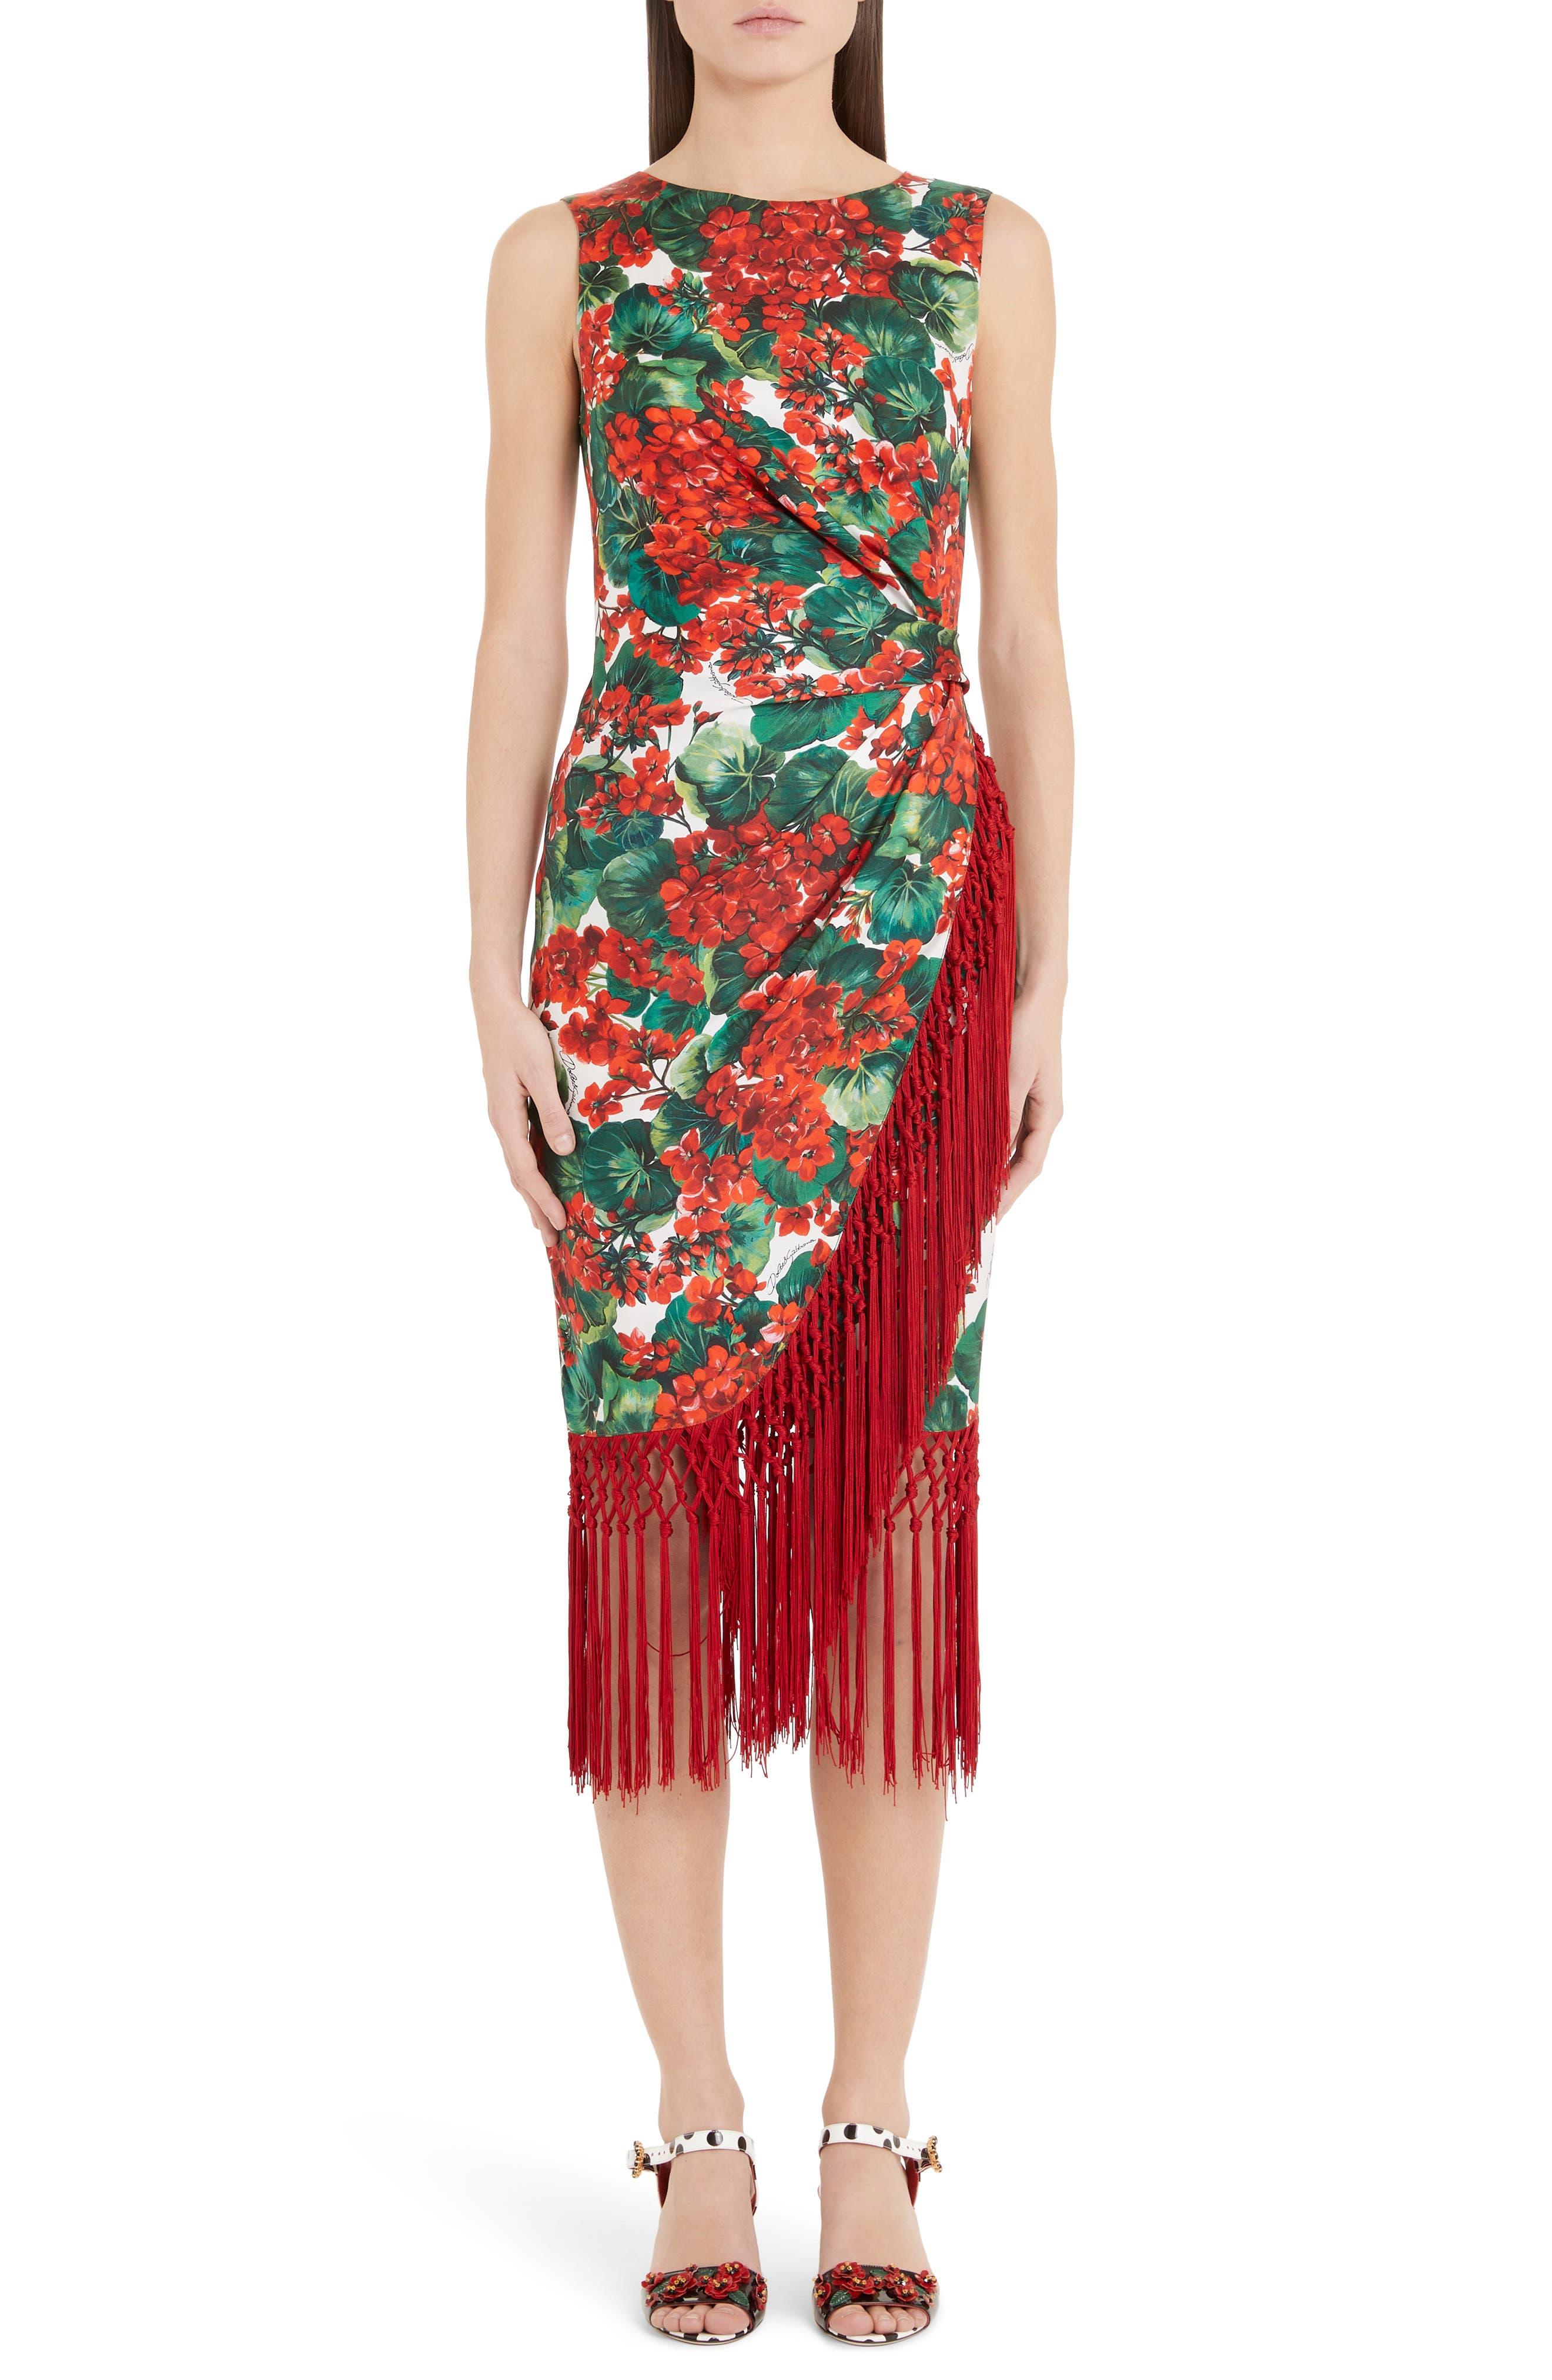 Dolce & gabbana Geranium Print Fringe Trim Midi Dress, US / 42 IT - Red